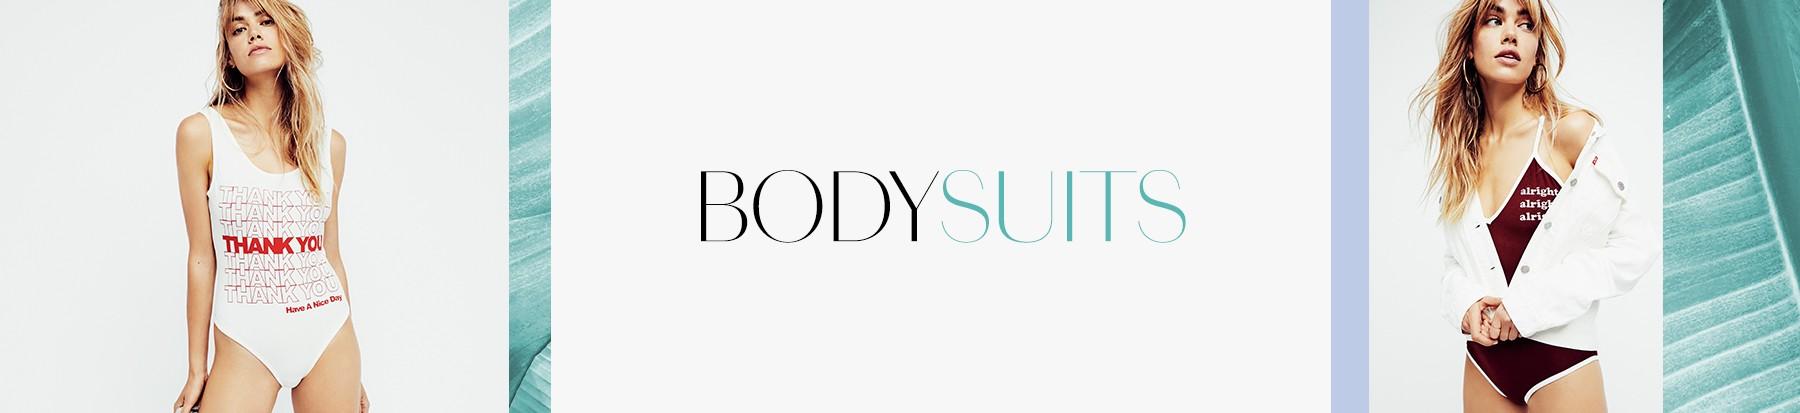 Graphic Bodysuits